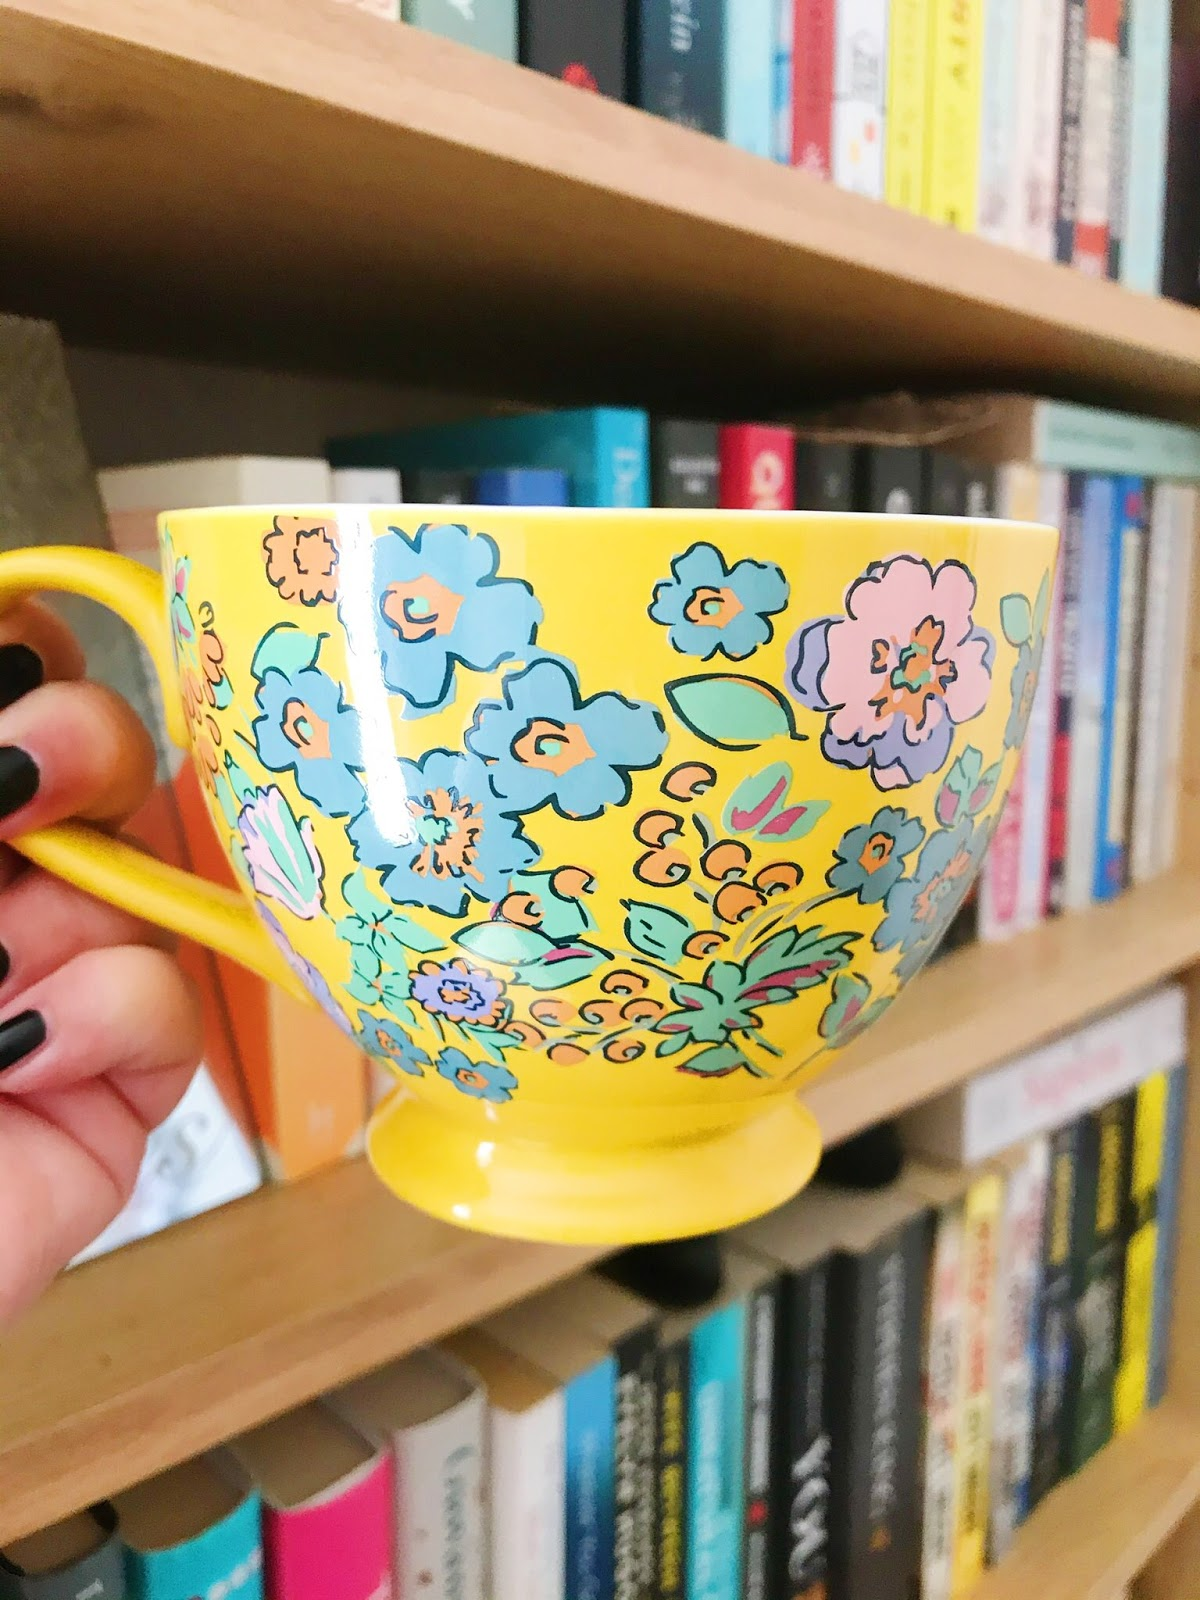 Yellow mug held up in front of bookshelf